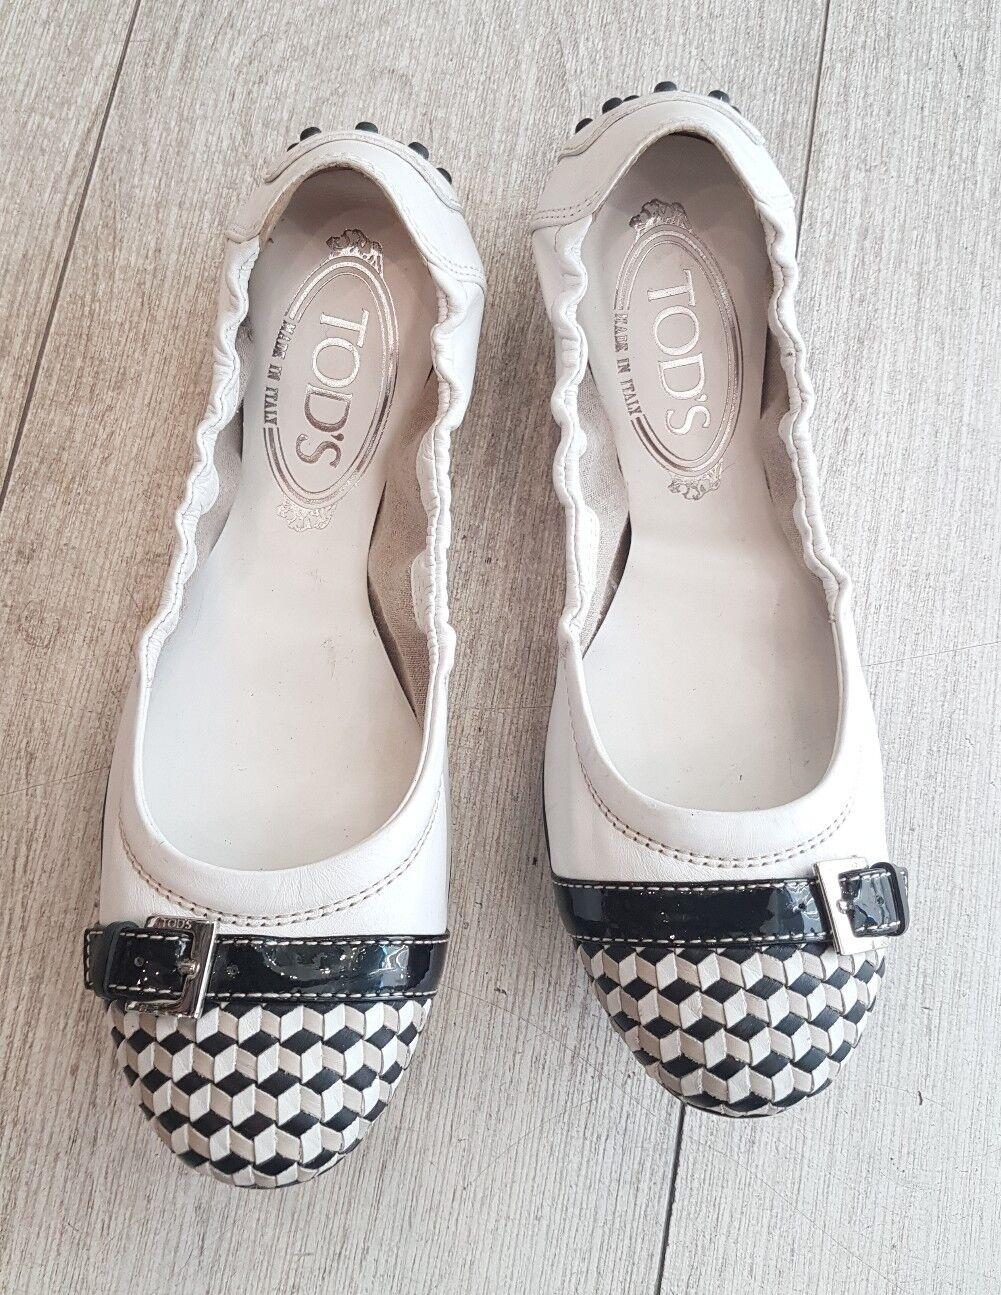 Ballerinas TOD& 039;S   Sehr Guter Zustand   Schuhe Halbschuhe Größe 35 Tods schuhe